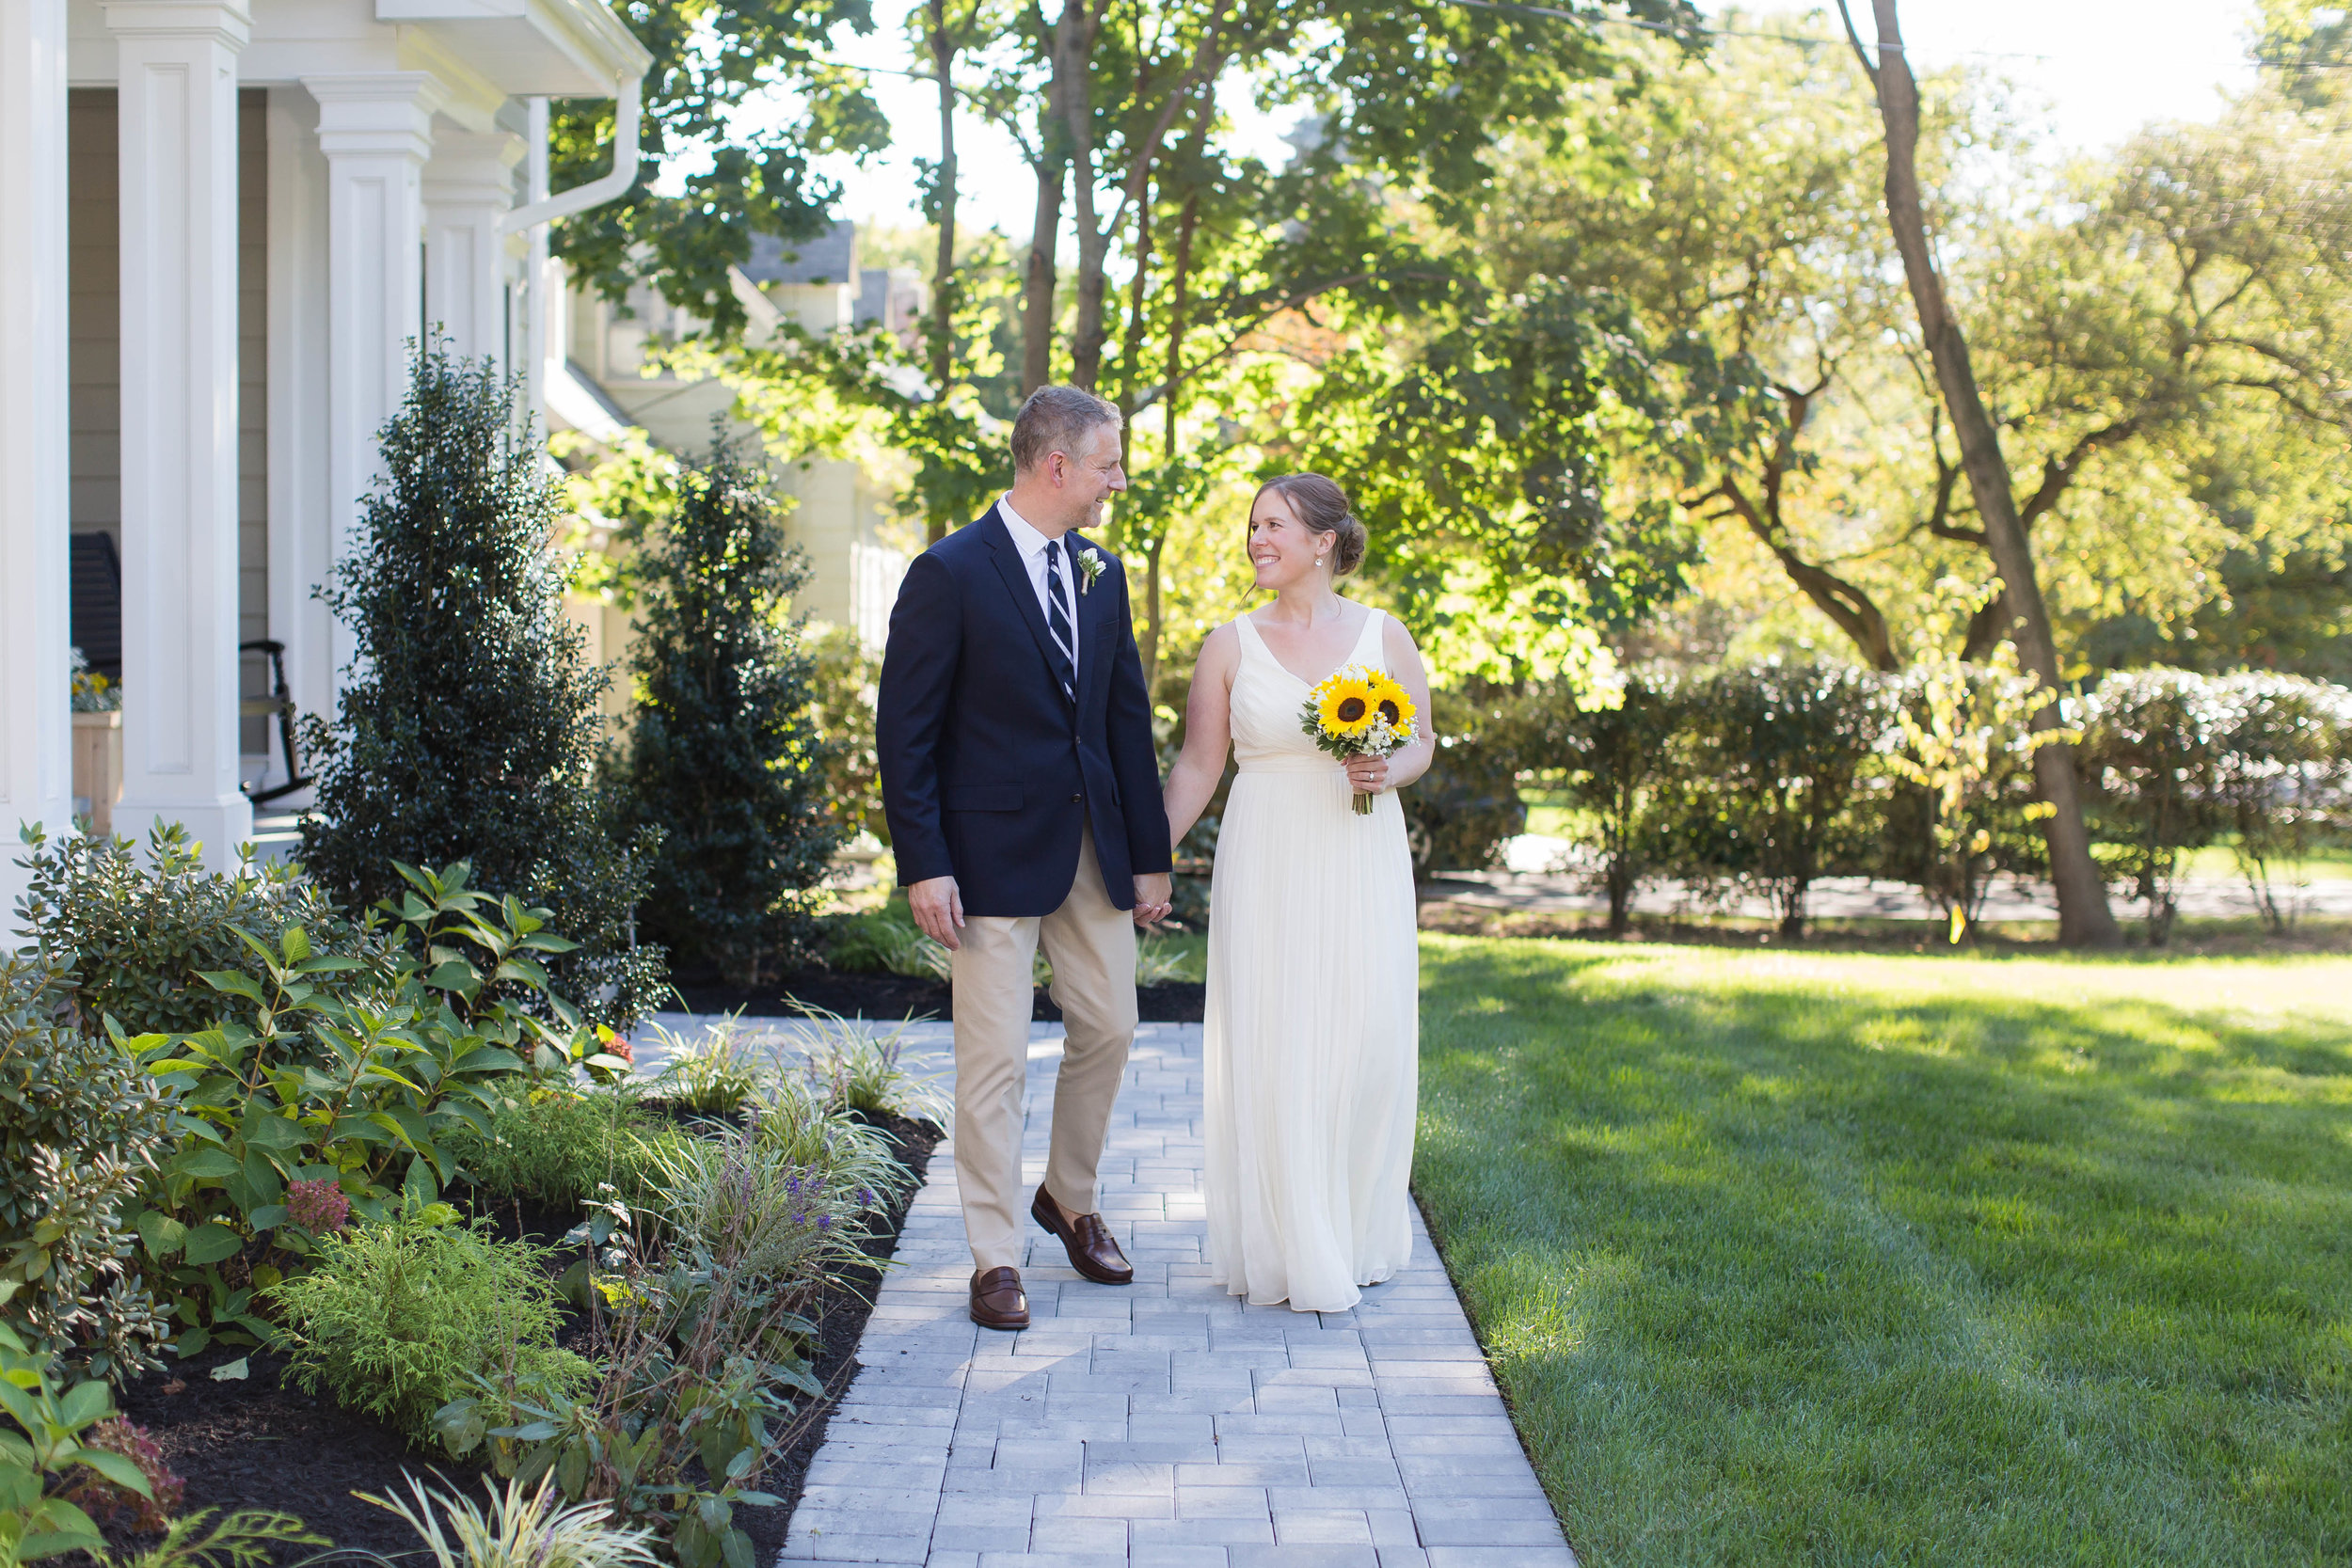 Westfield New Jersey Backyard wedding